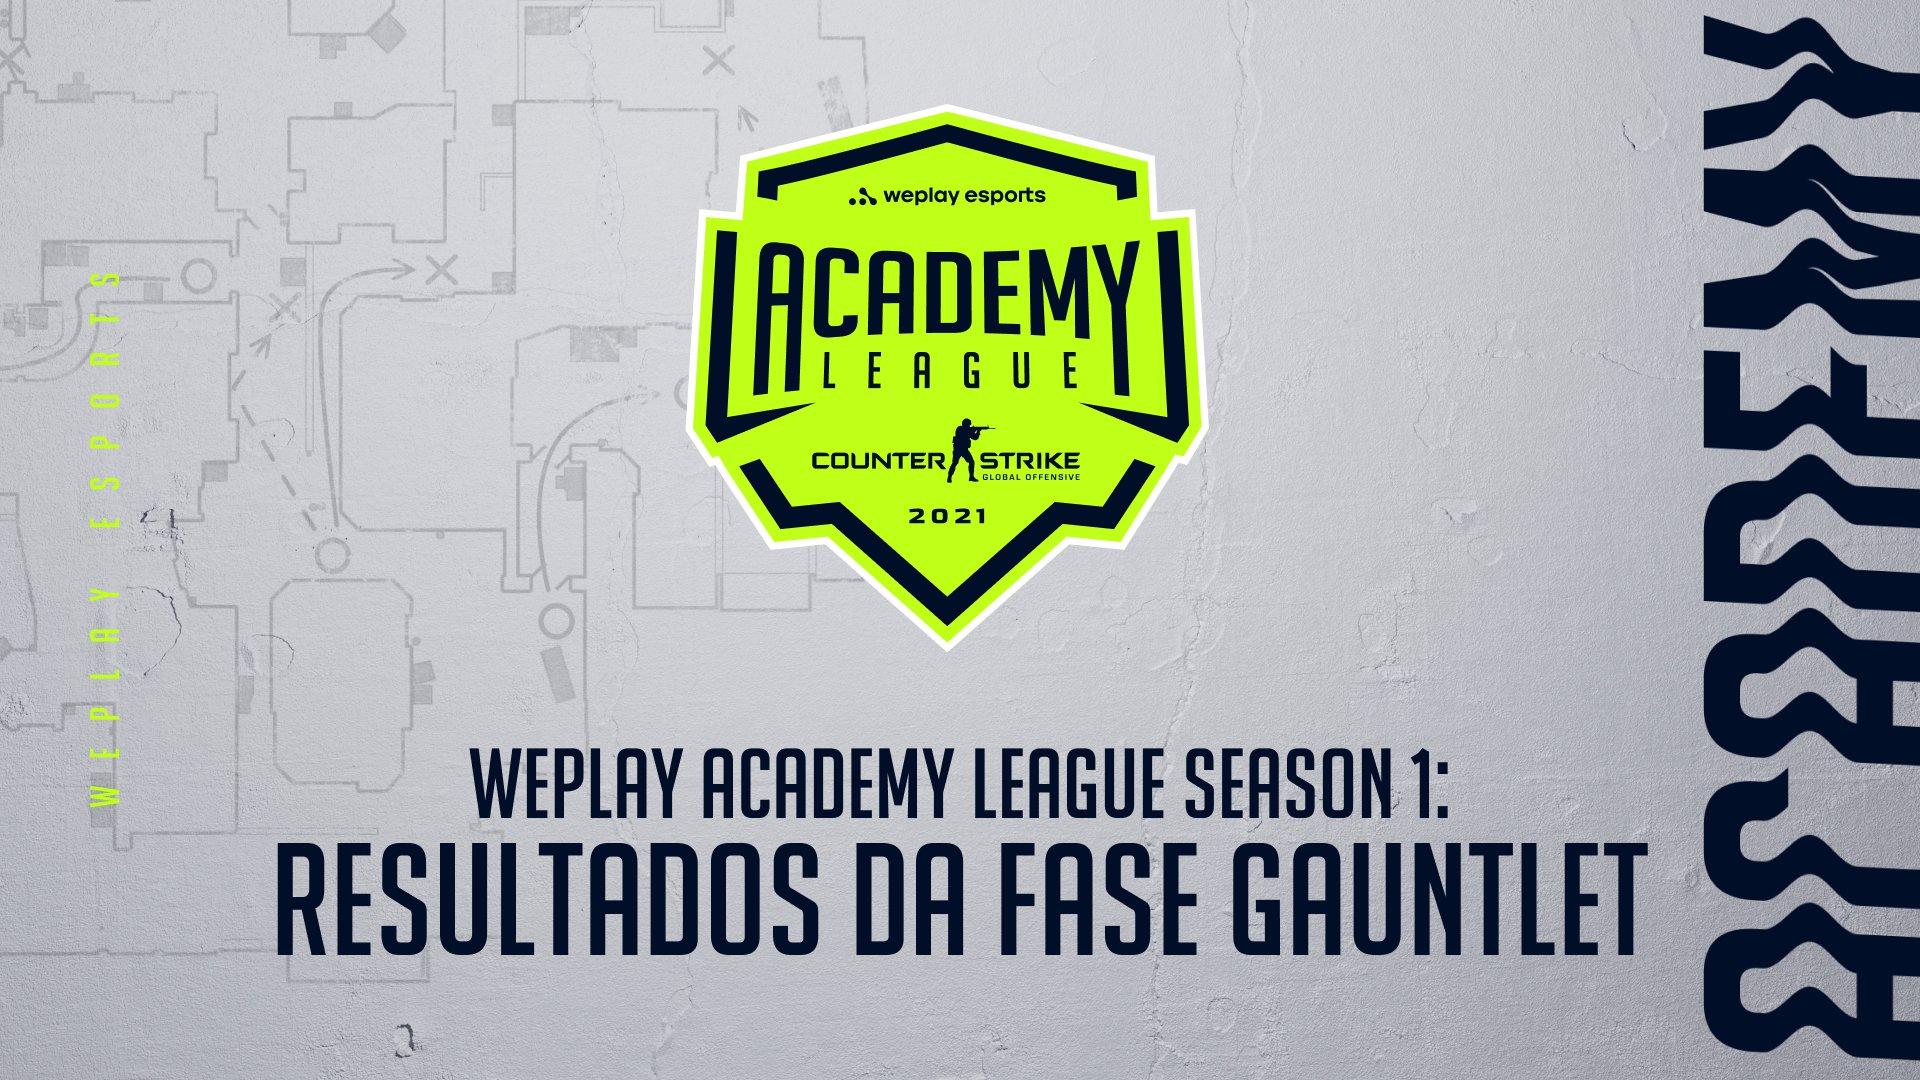 WePlay Academy League Season 1: Resultados da Fase Gauntlet. Imagem: WePlay Holding